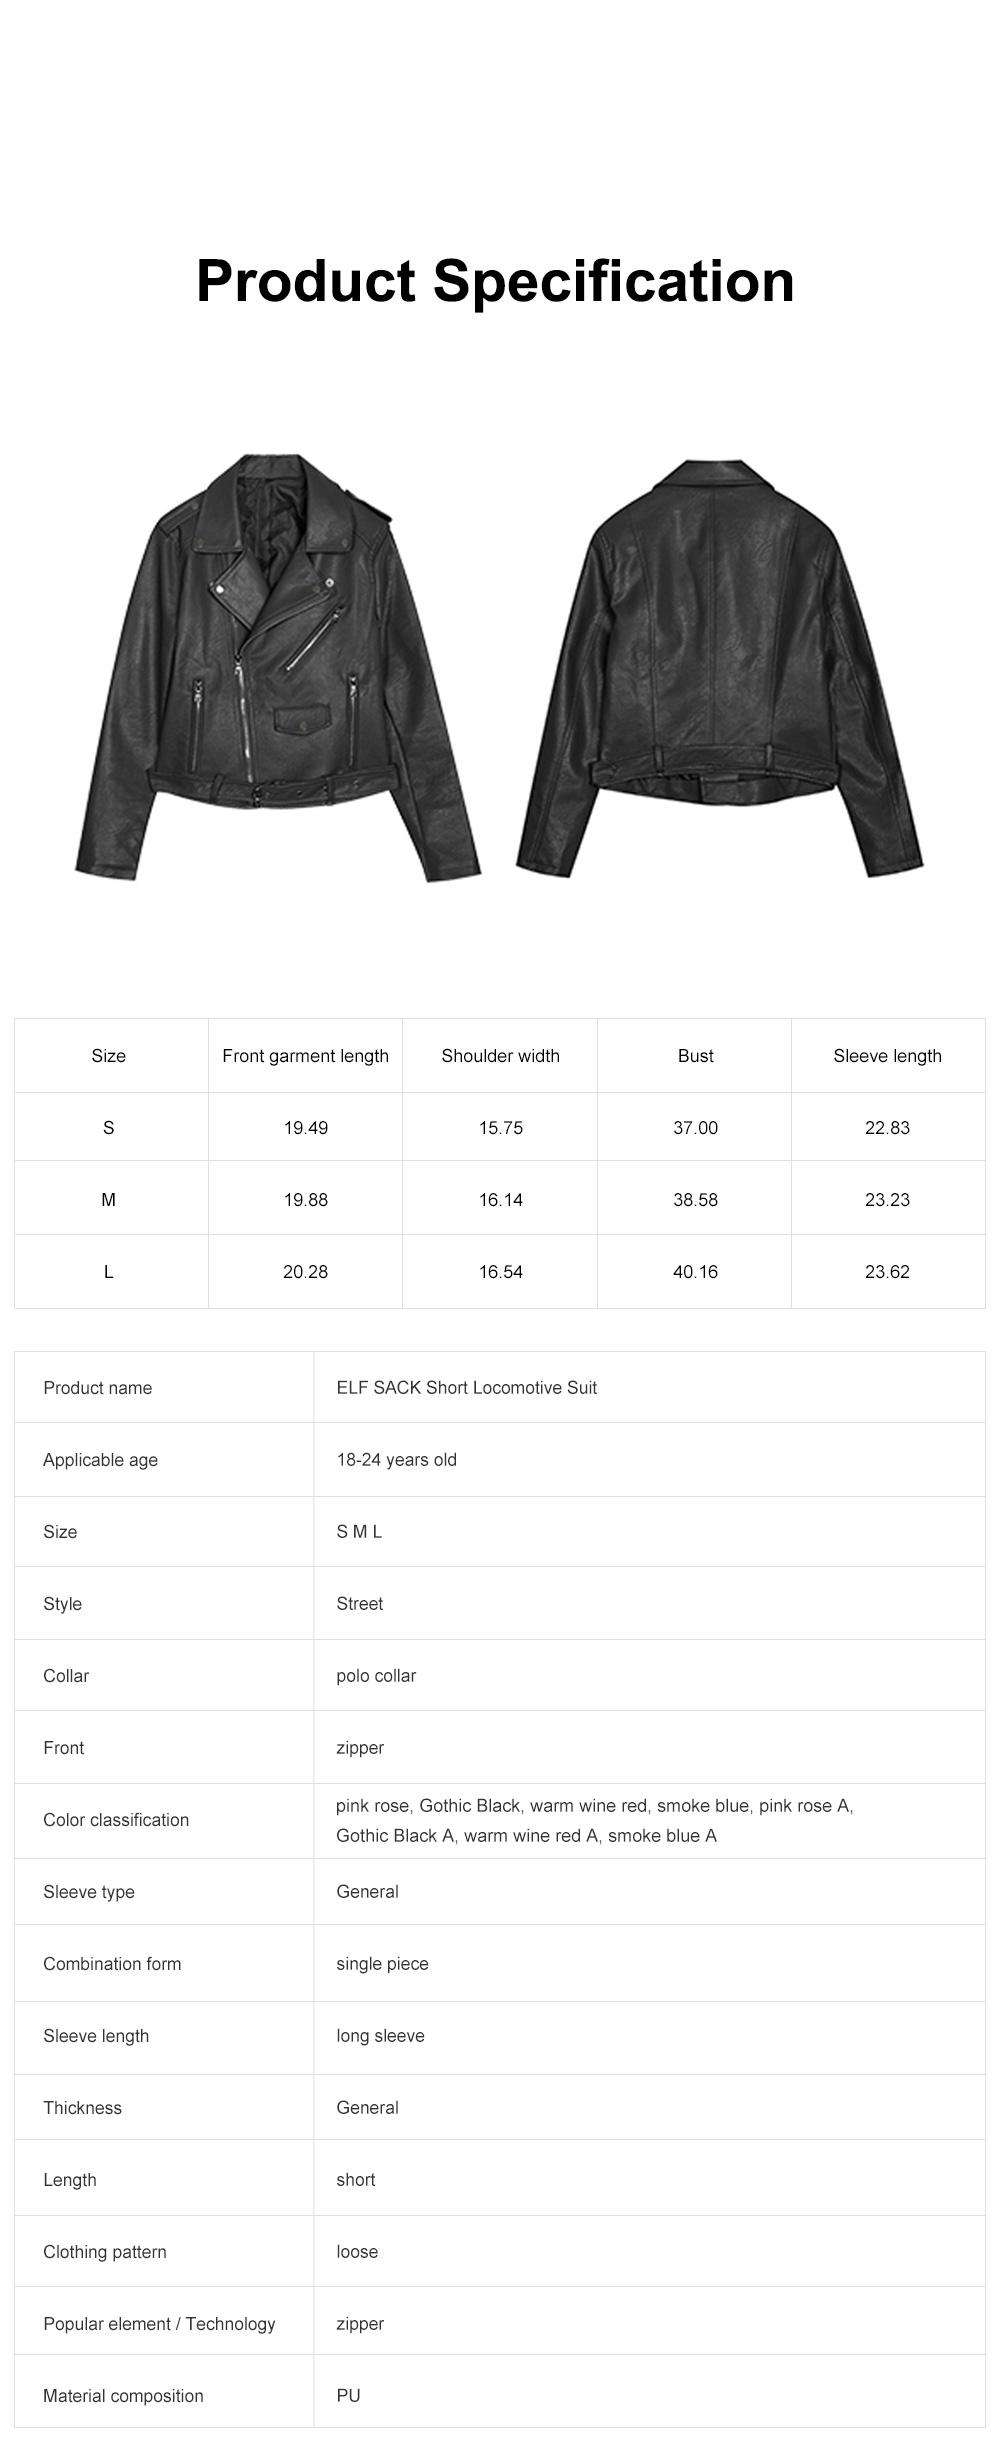 ELFSACK Short Locomotive Suit New Retro Loose Black PU Leather Top in Autumn 2019 Girls' Top Coat 6